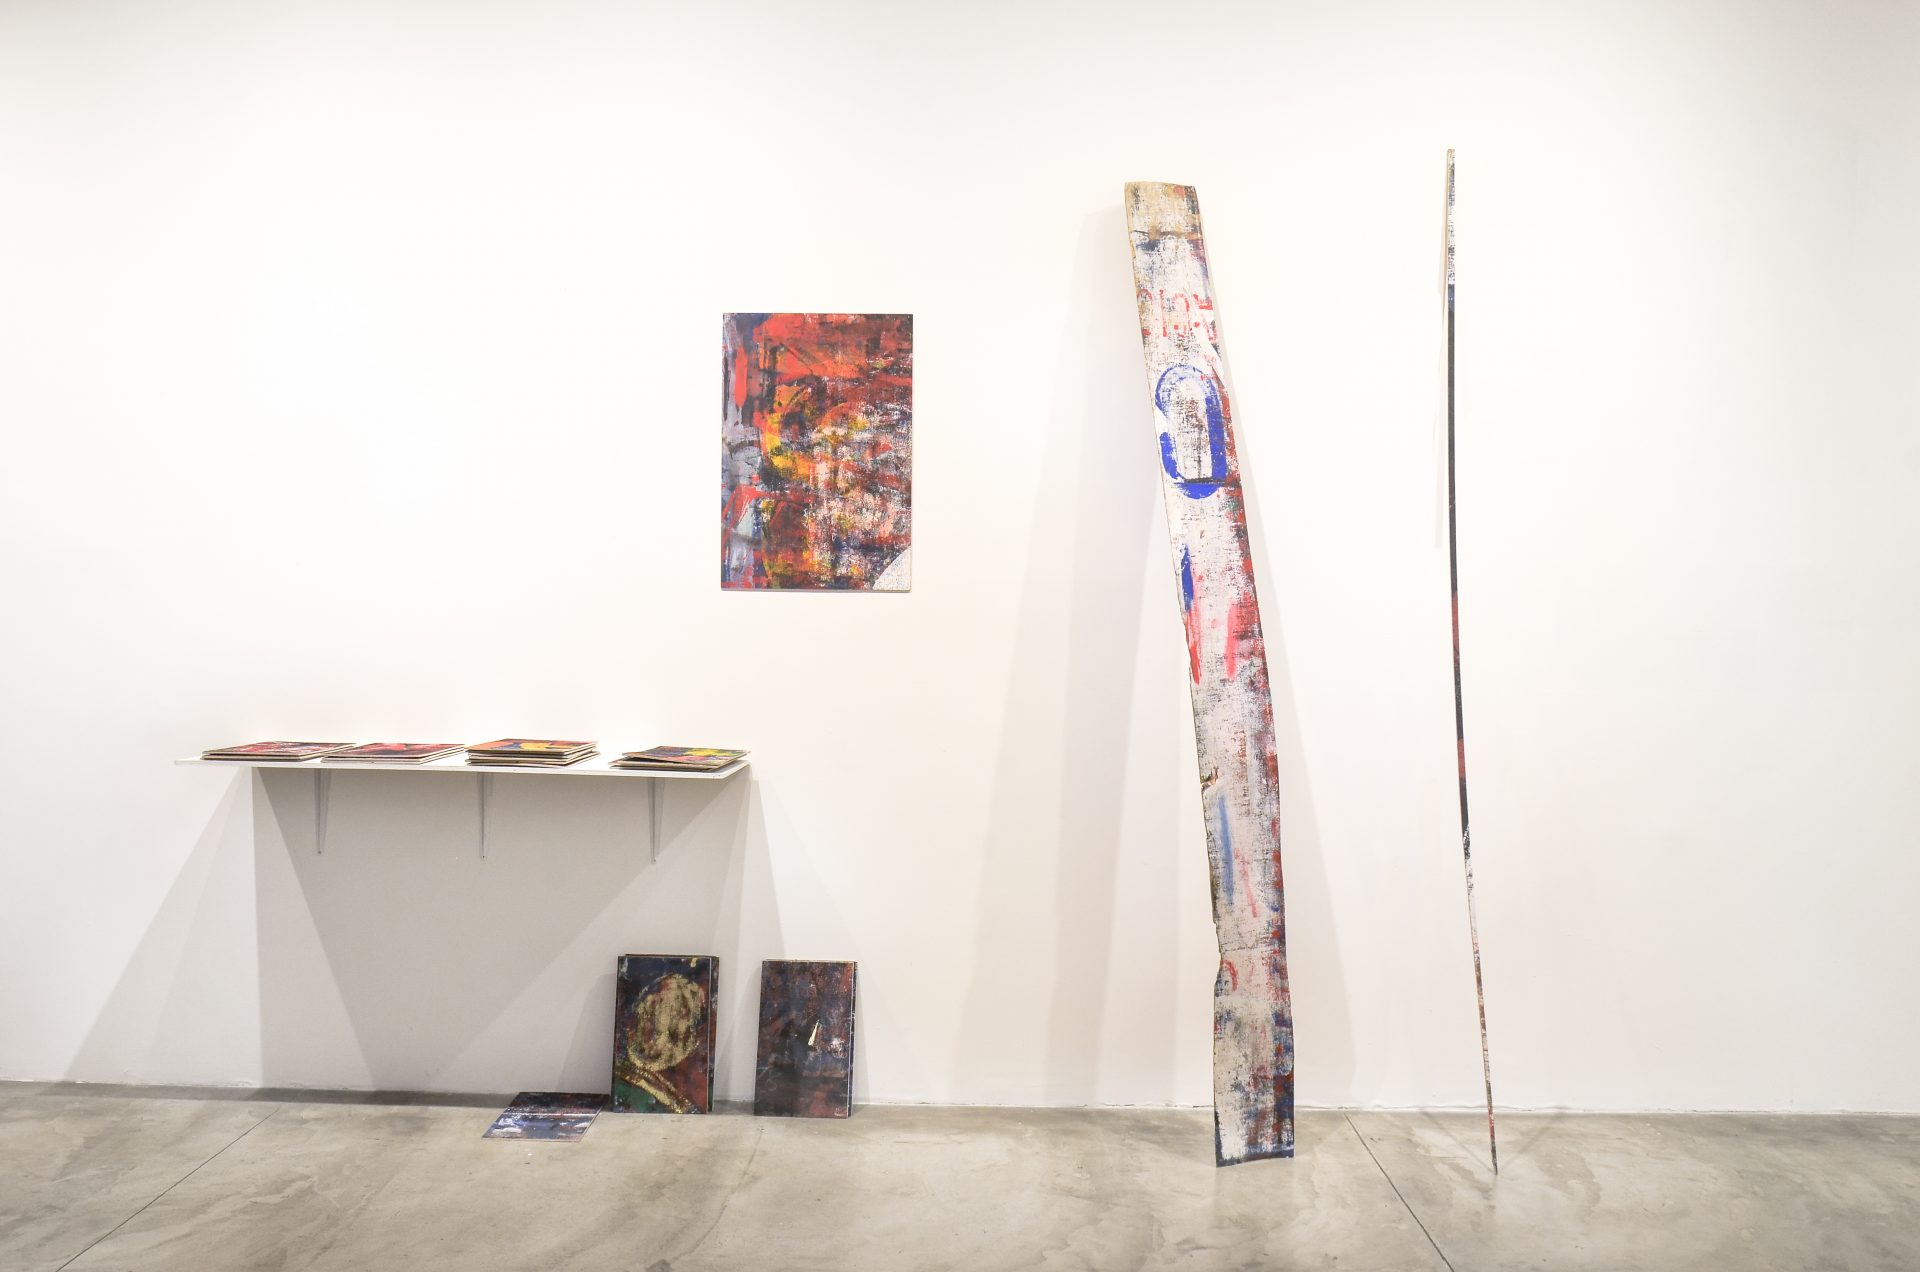 Kiosko Galeria, Santa Cruz de la Sierra, Bolivia, 2018 (solo show)